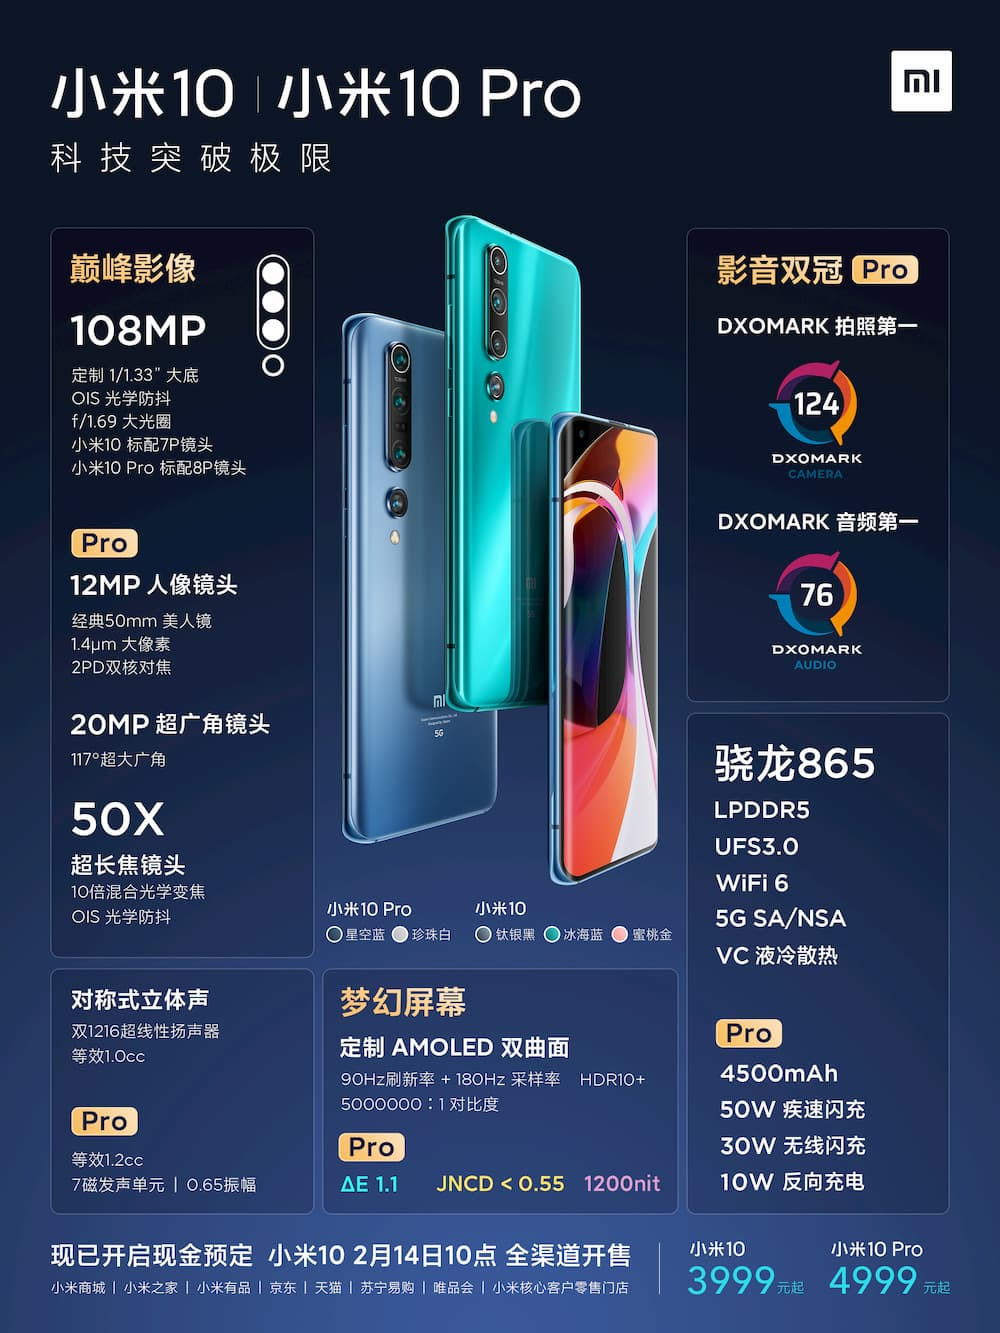 Xiaomi 10 / Xiaomi 10 Pro 马来西亚发布会定 4 月 22 日举办 2